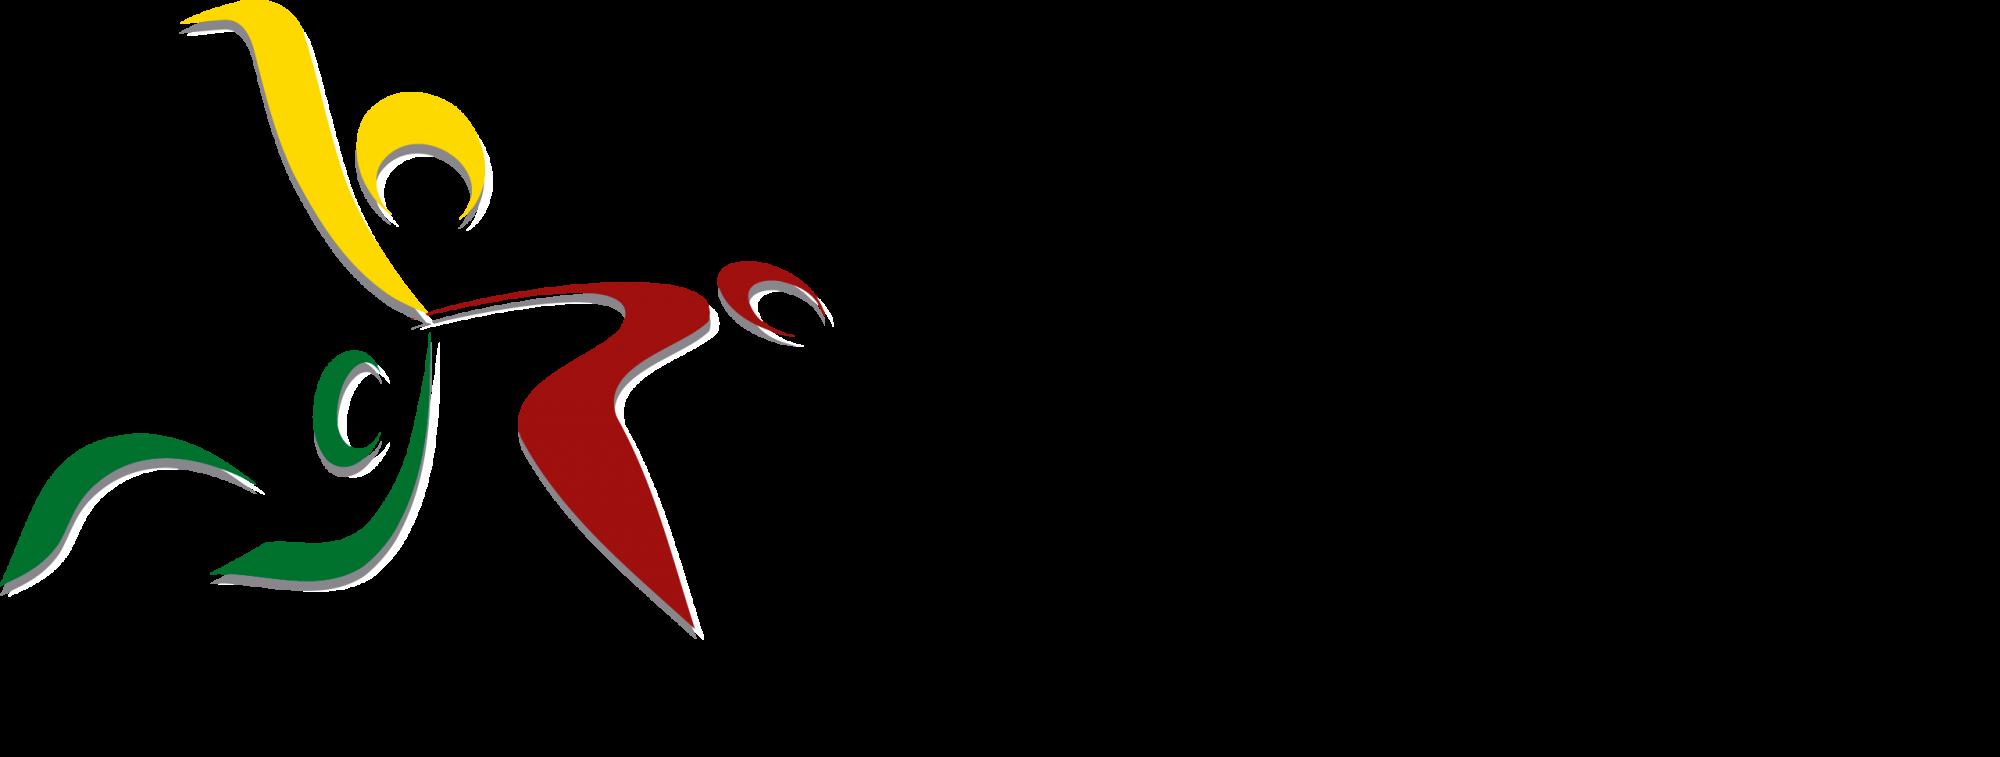 Federacao de Triatlo de Portugal logo